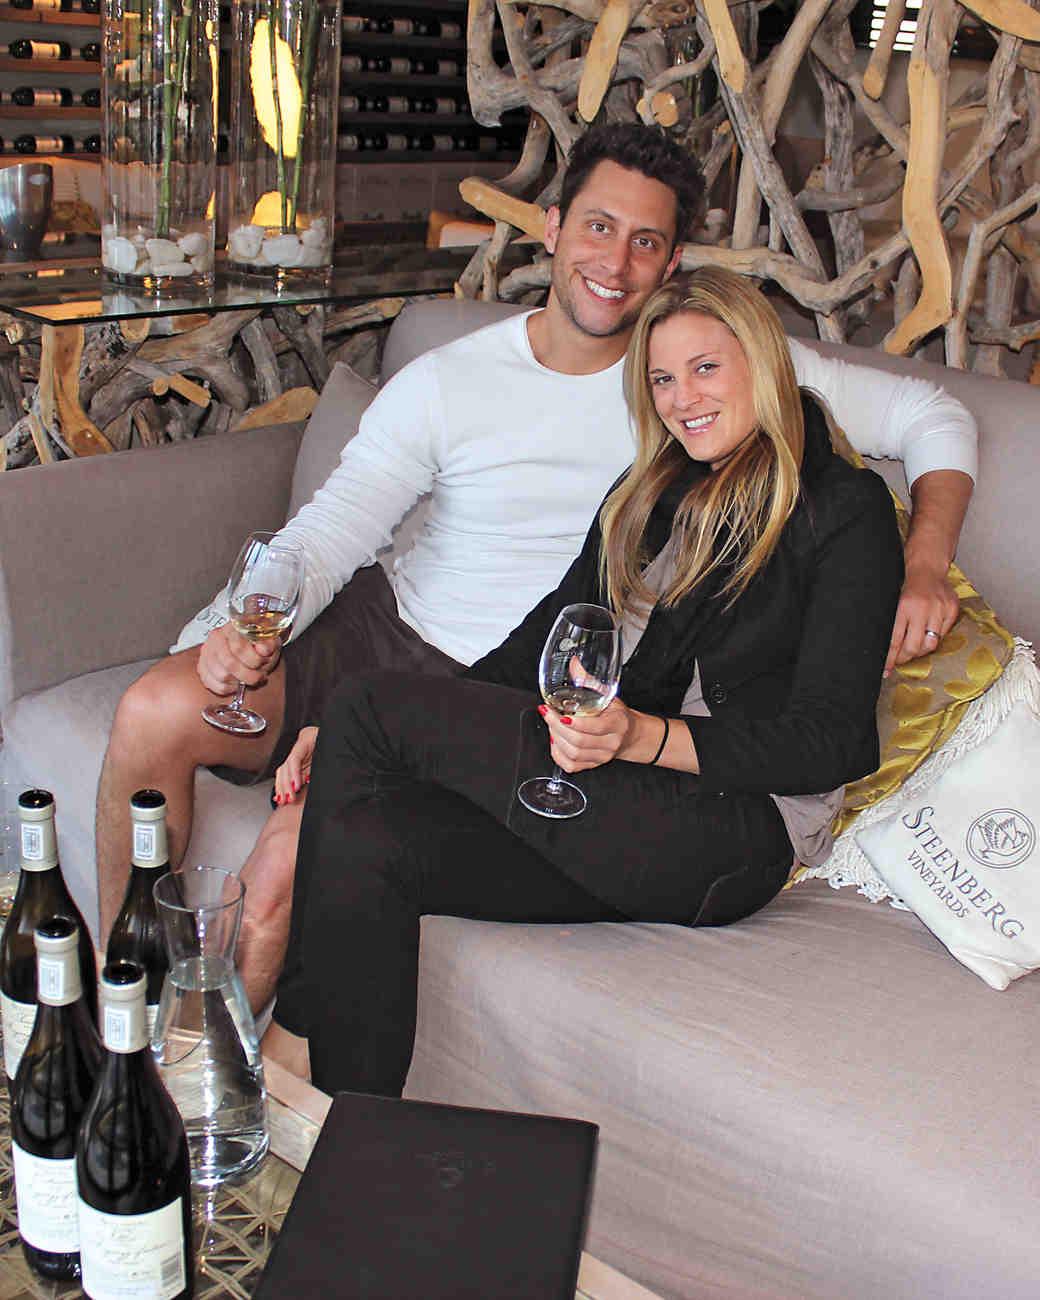 steenberg-vineyards-mws109850.jpg